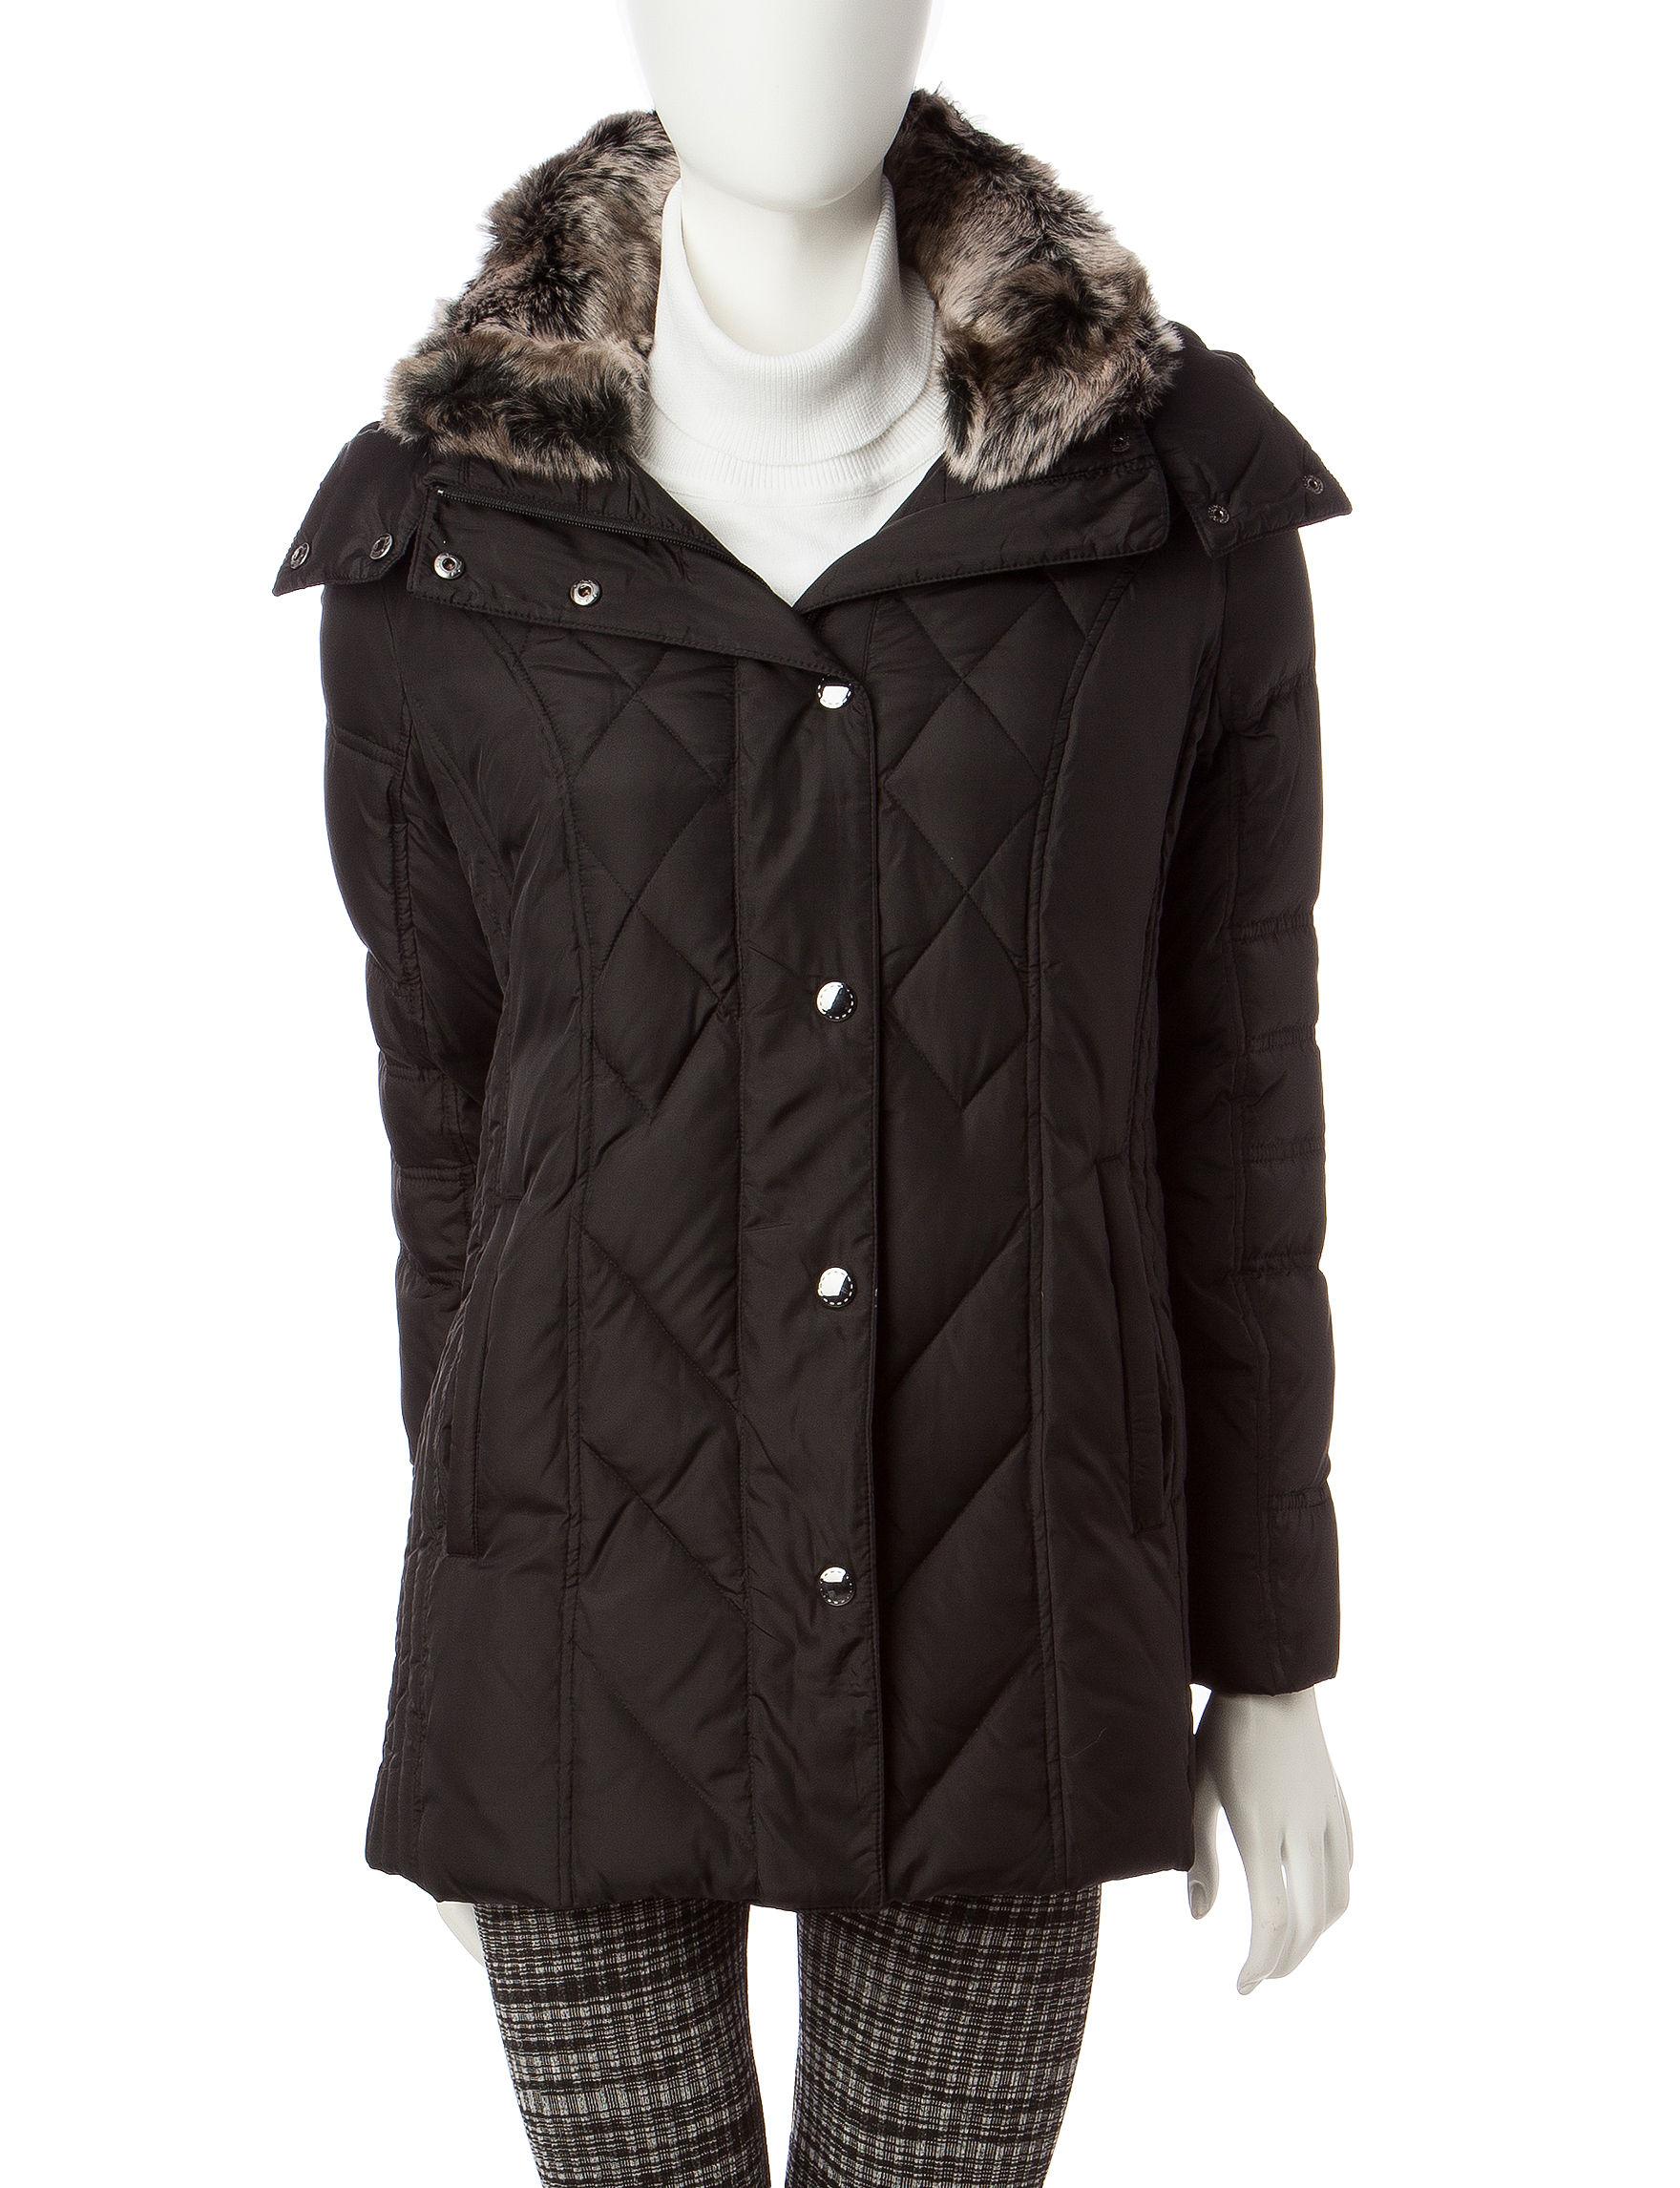 London Fog Black Rain & Snow Jackets